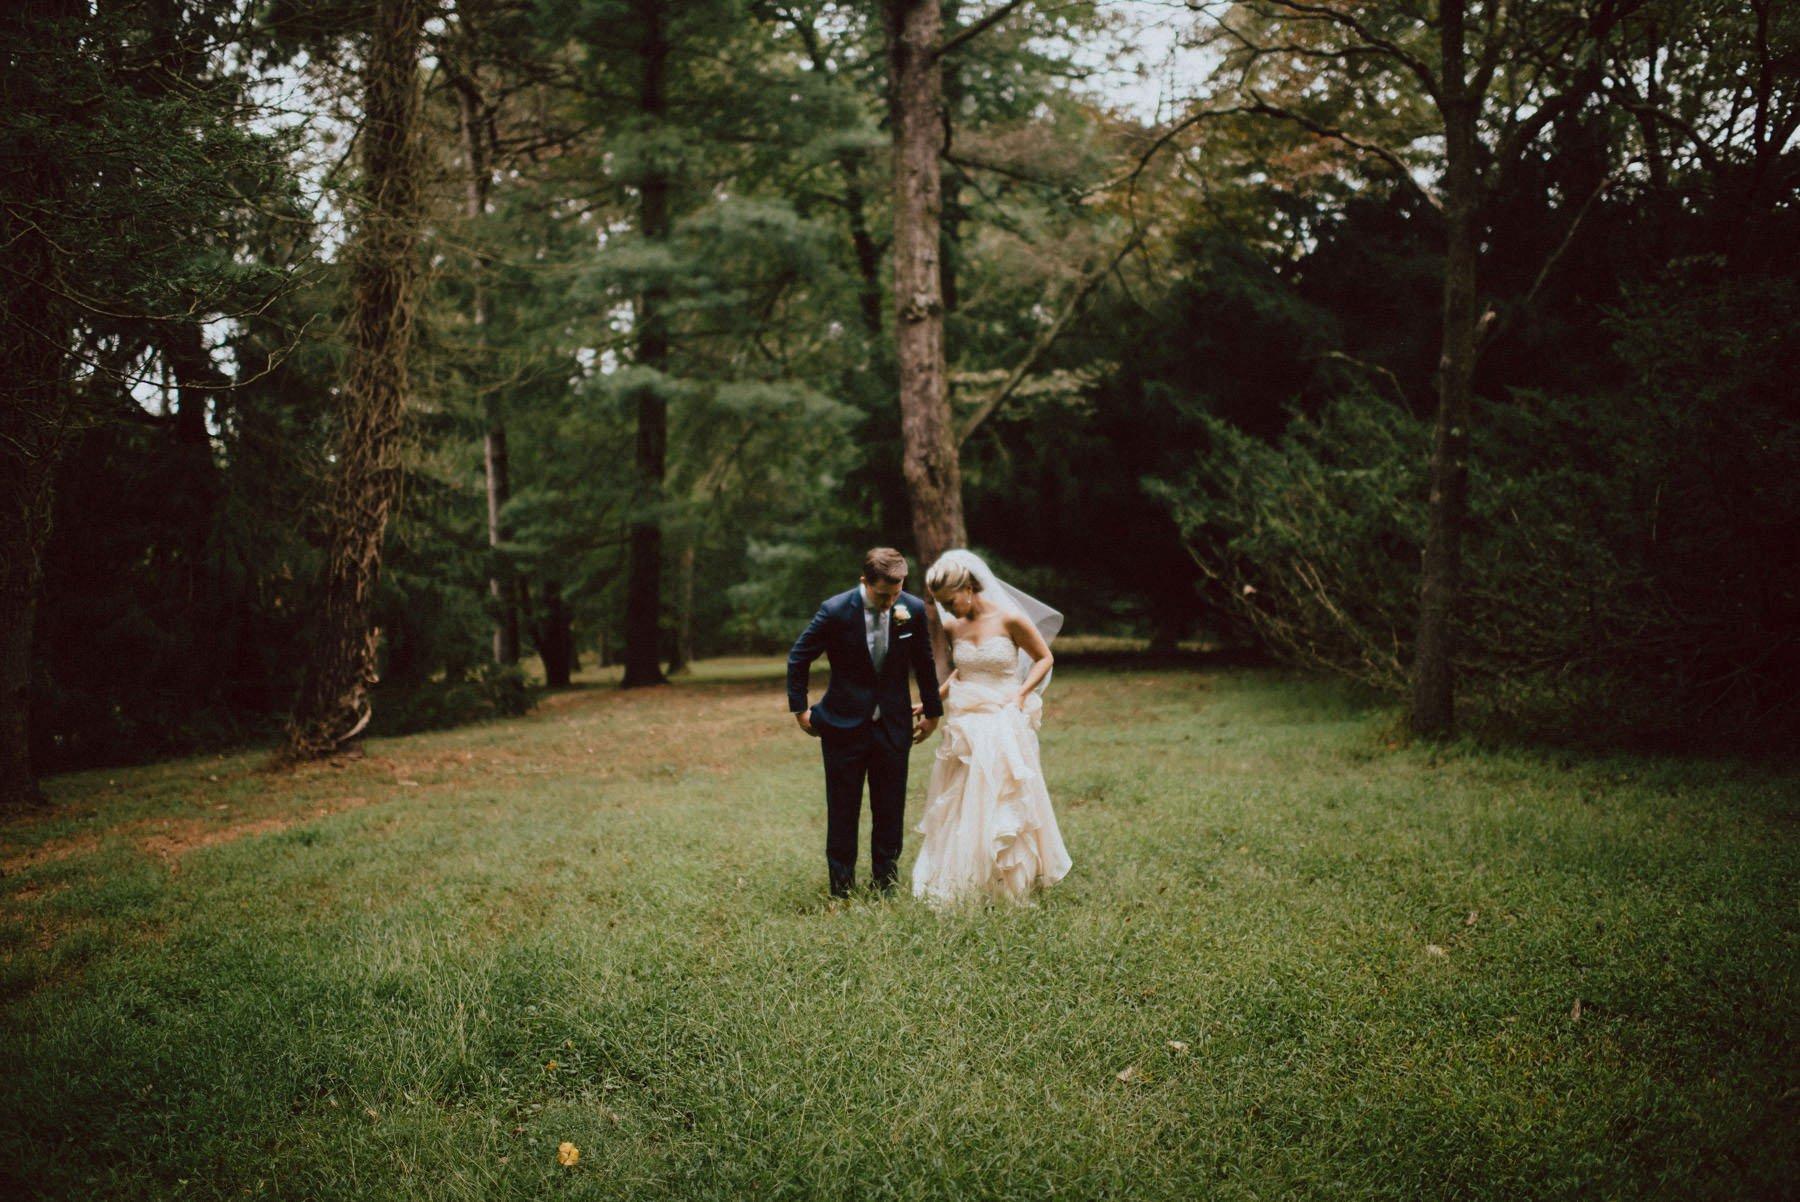 greenville-country-club-wedding-86.jpg